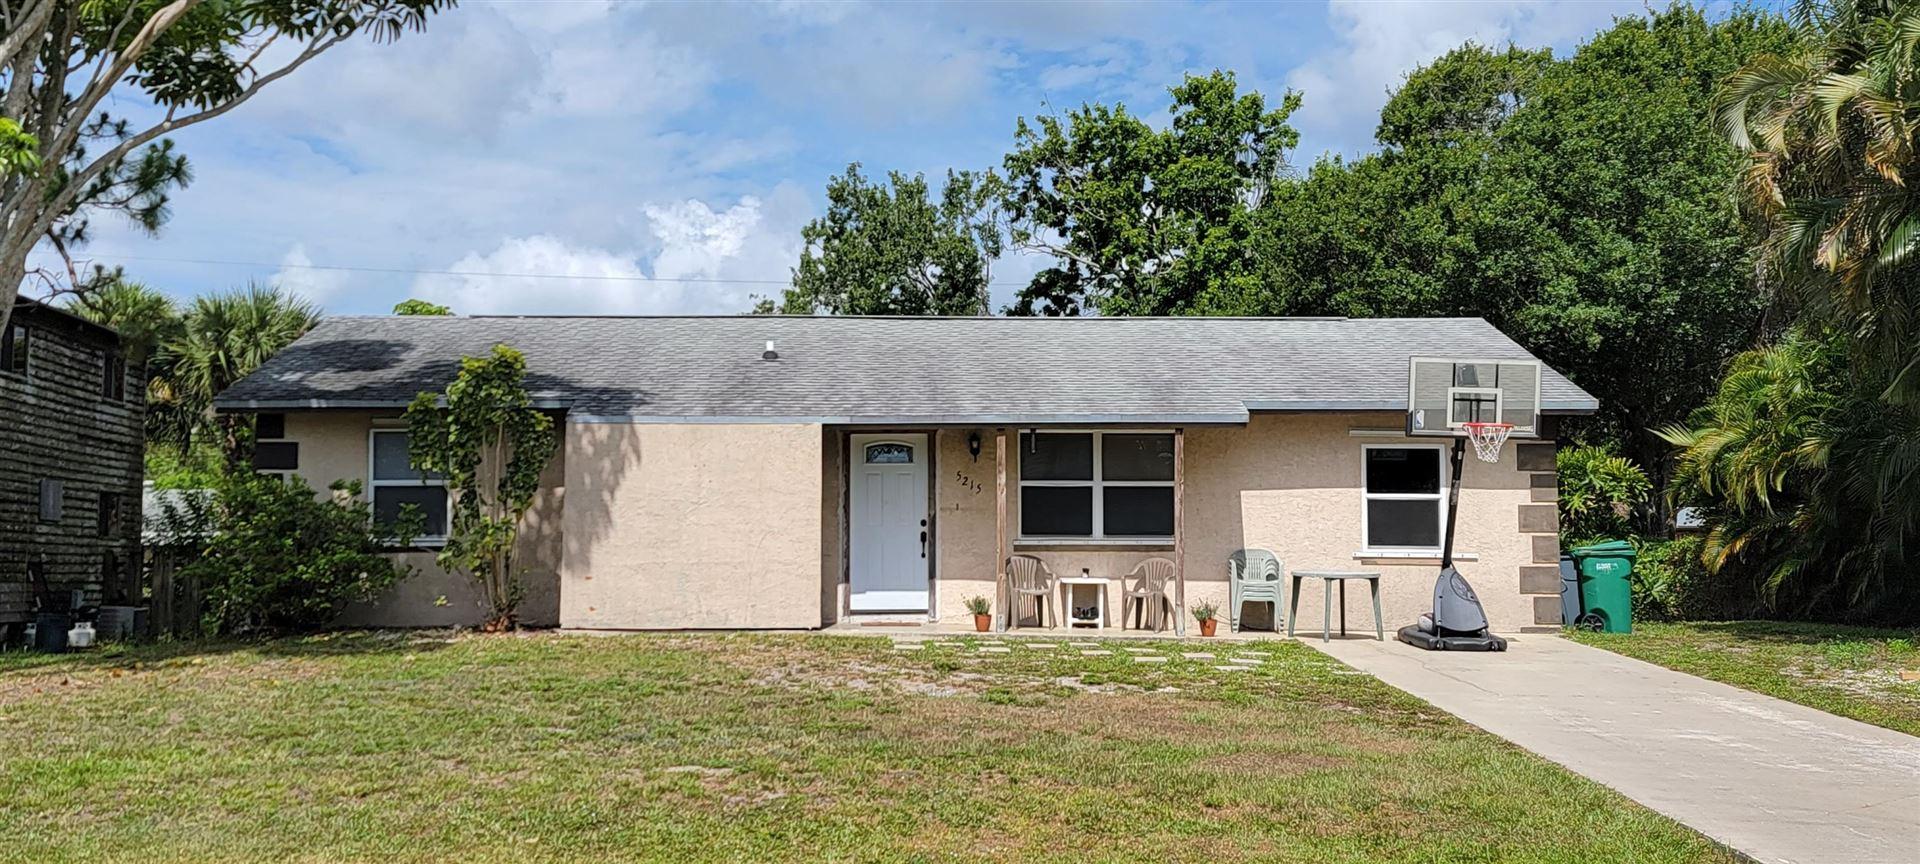 5215 Sunset Boulevard, Fort Pierce, FL 34982 - #: RX-10716010